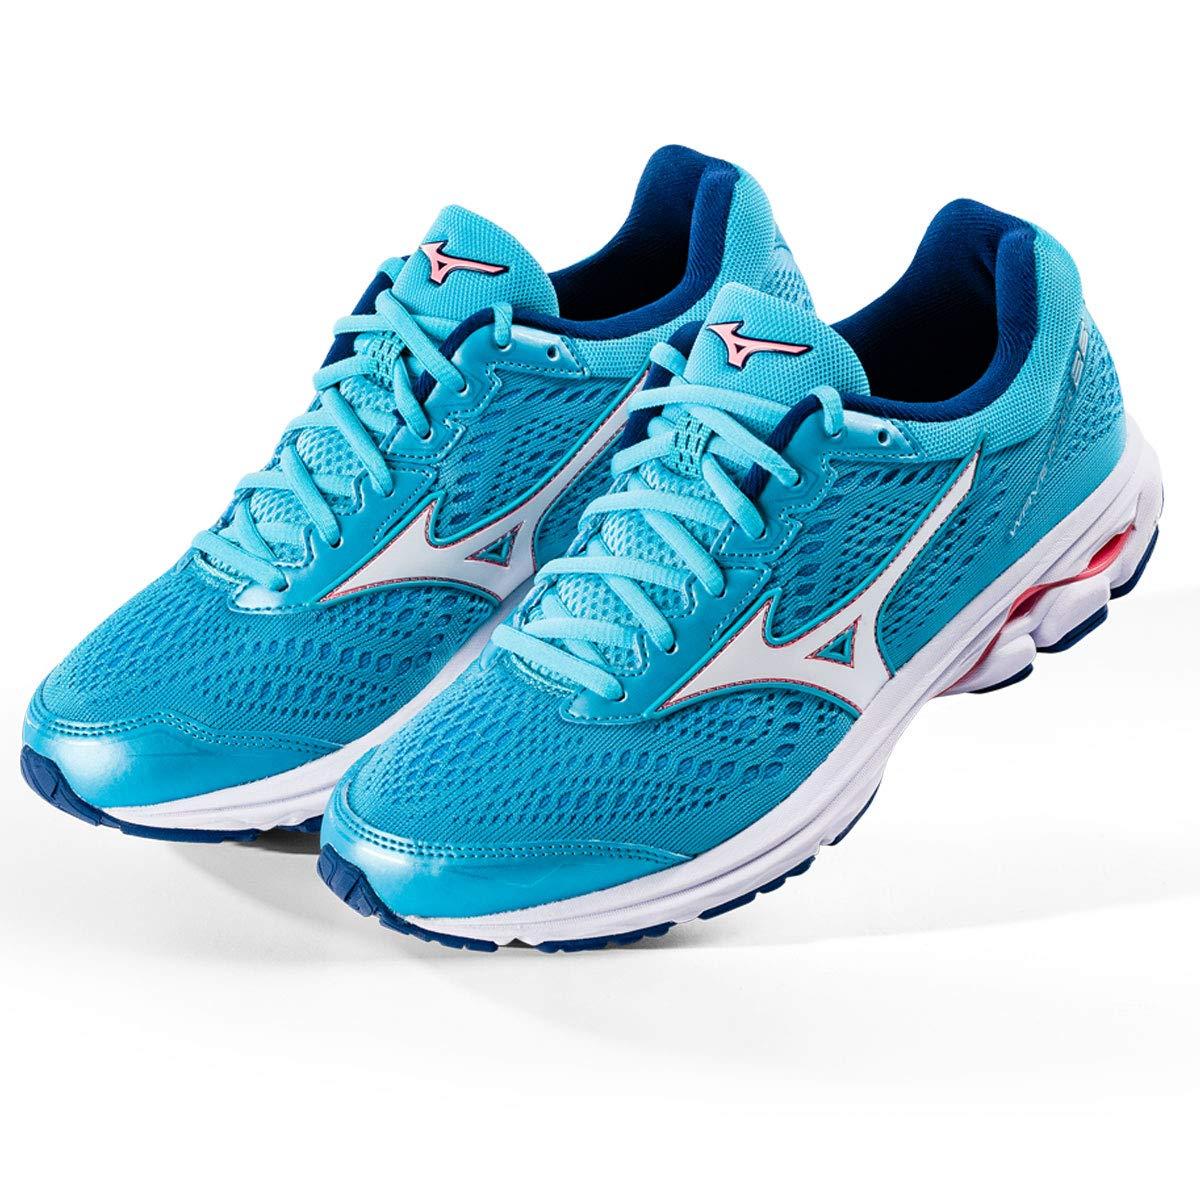 Mizuno Wave Rider 22, Zapatillas de Running para Mujer 41 EU|Azul (Blueatoll/White/Georgiapeach 01)